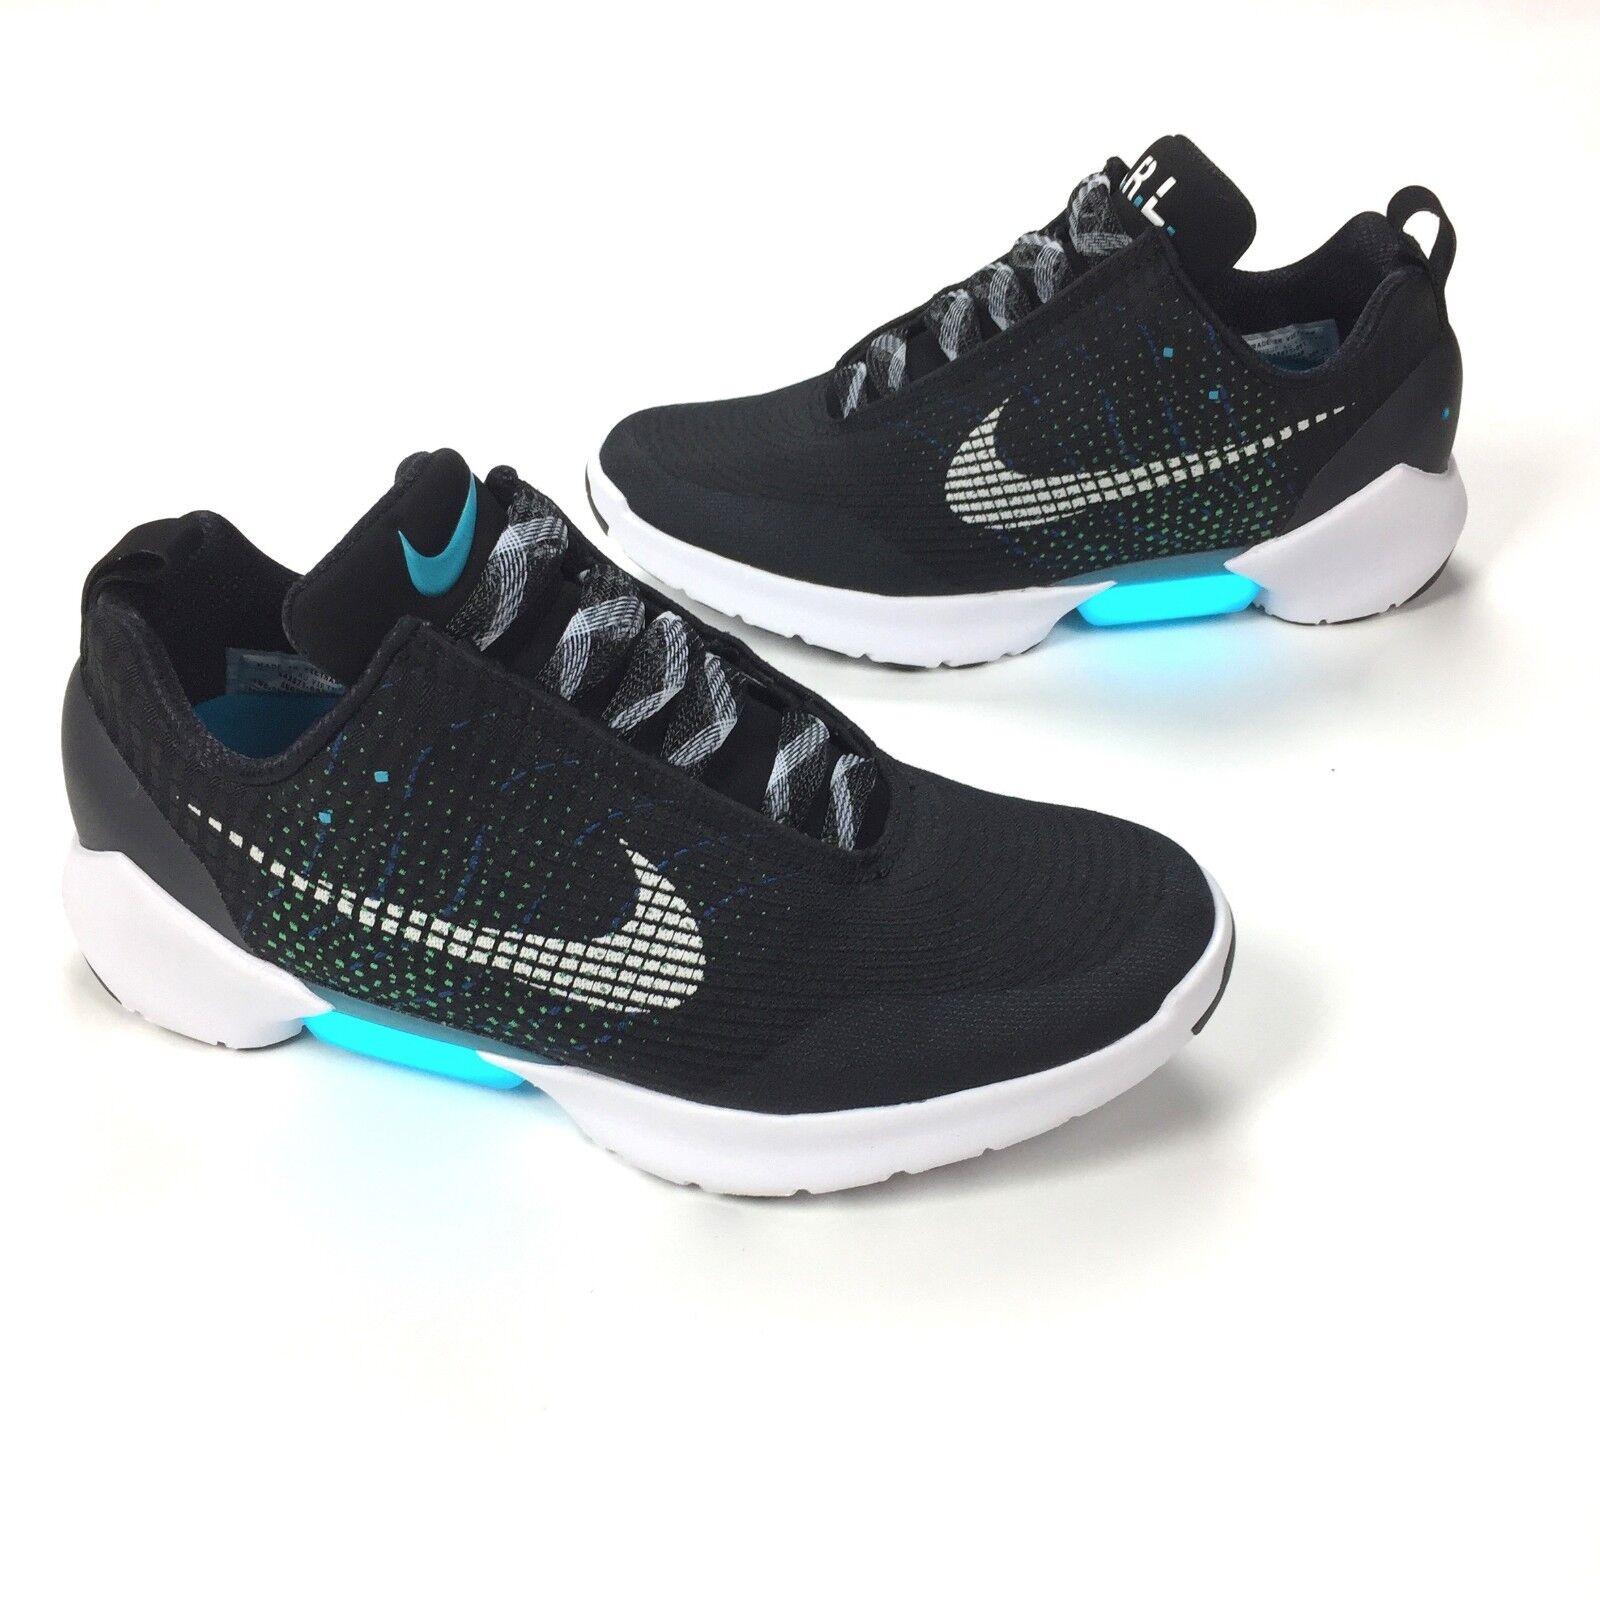 NWT Nike Hyper Adapt 1.0 EARL Self Lacing Sneakers Black Blue Lagoon AUTHENTIC